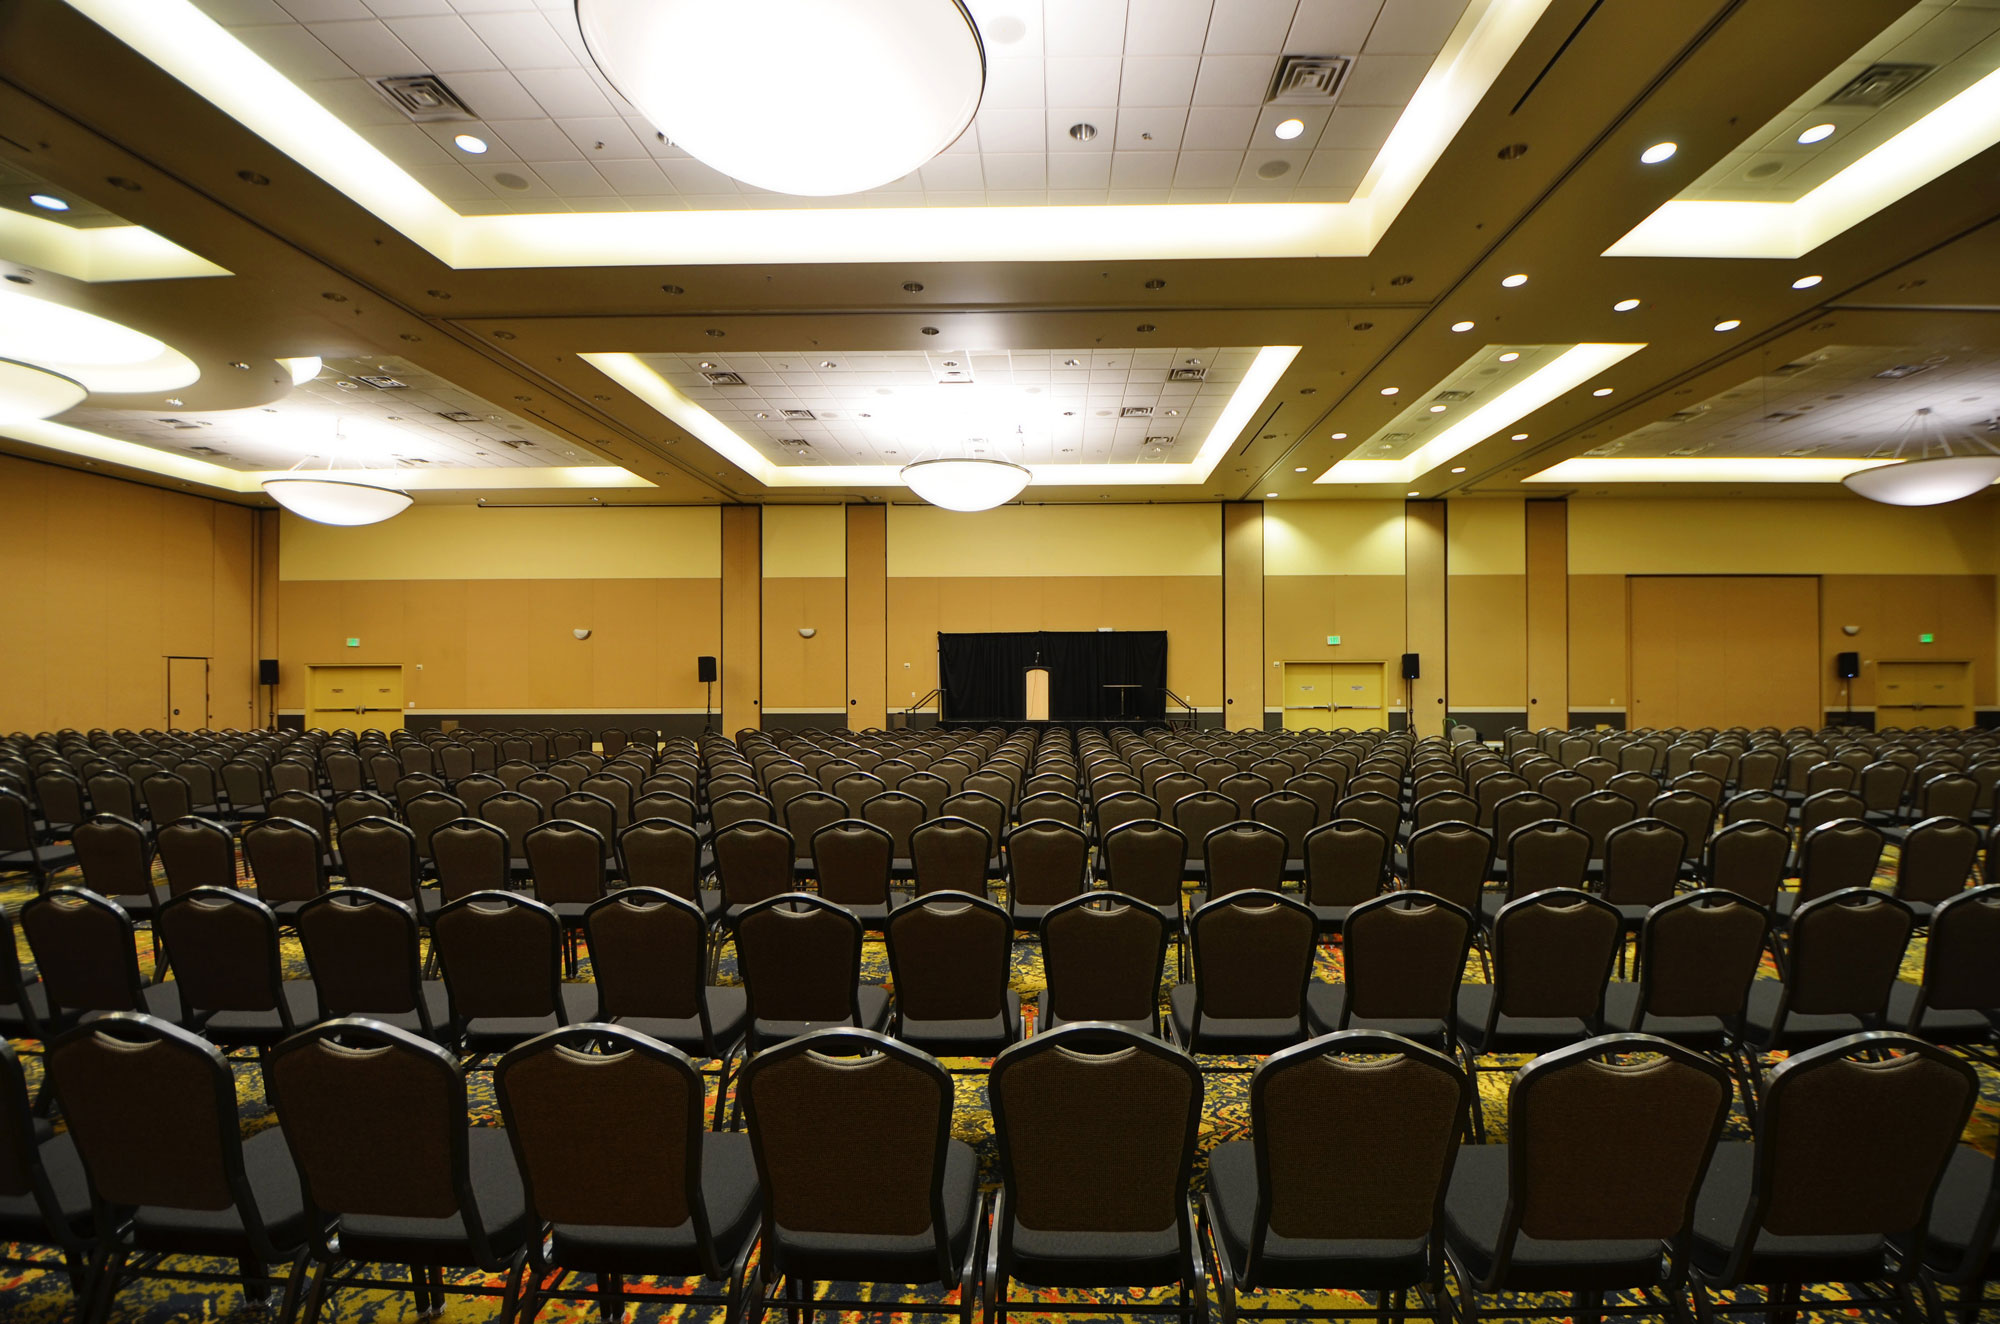 davis-conference-center-interior12-985e4efd87711110f3a2f74dfa6ec7bdb8eb9ddfaf470e14cdde39c7c5b0fa18